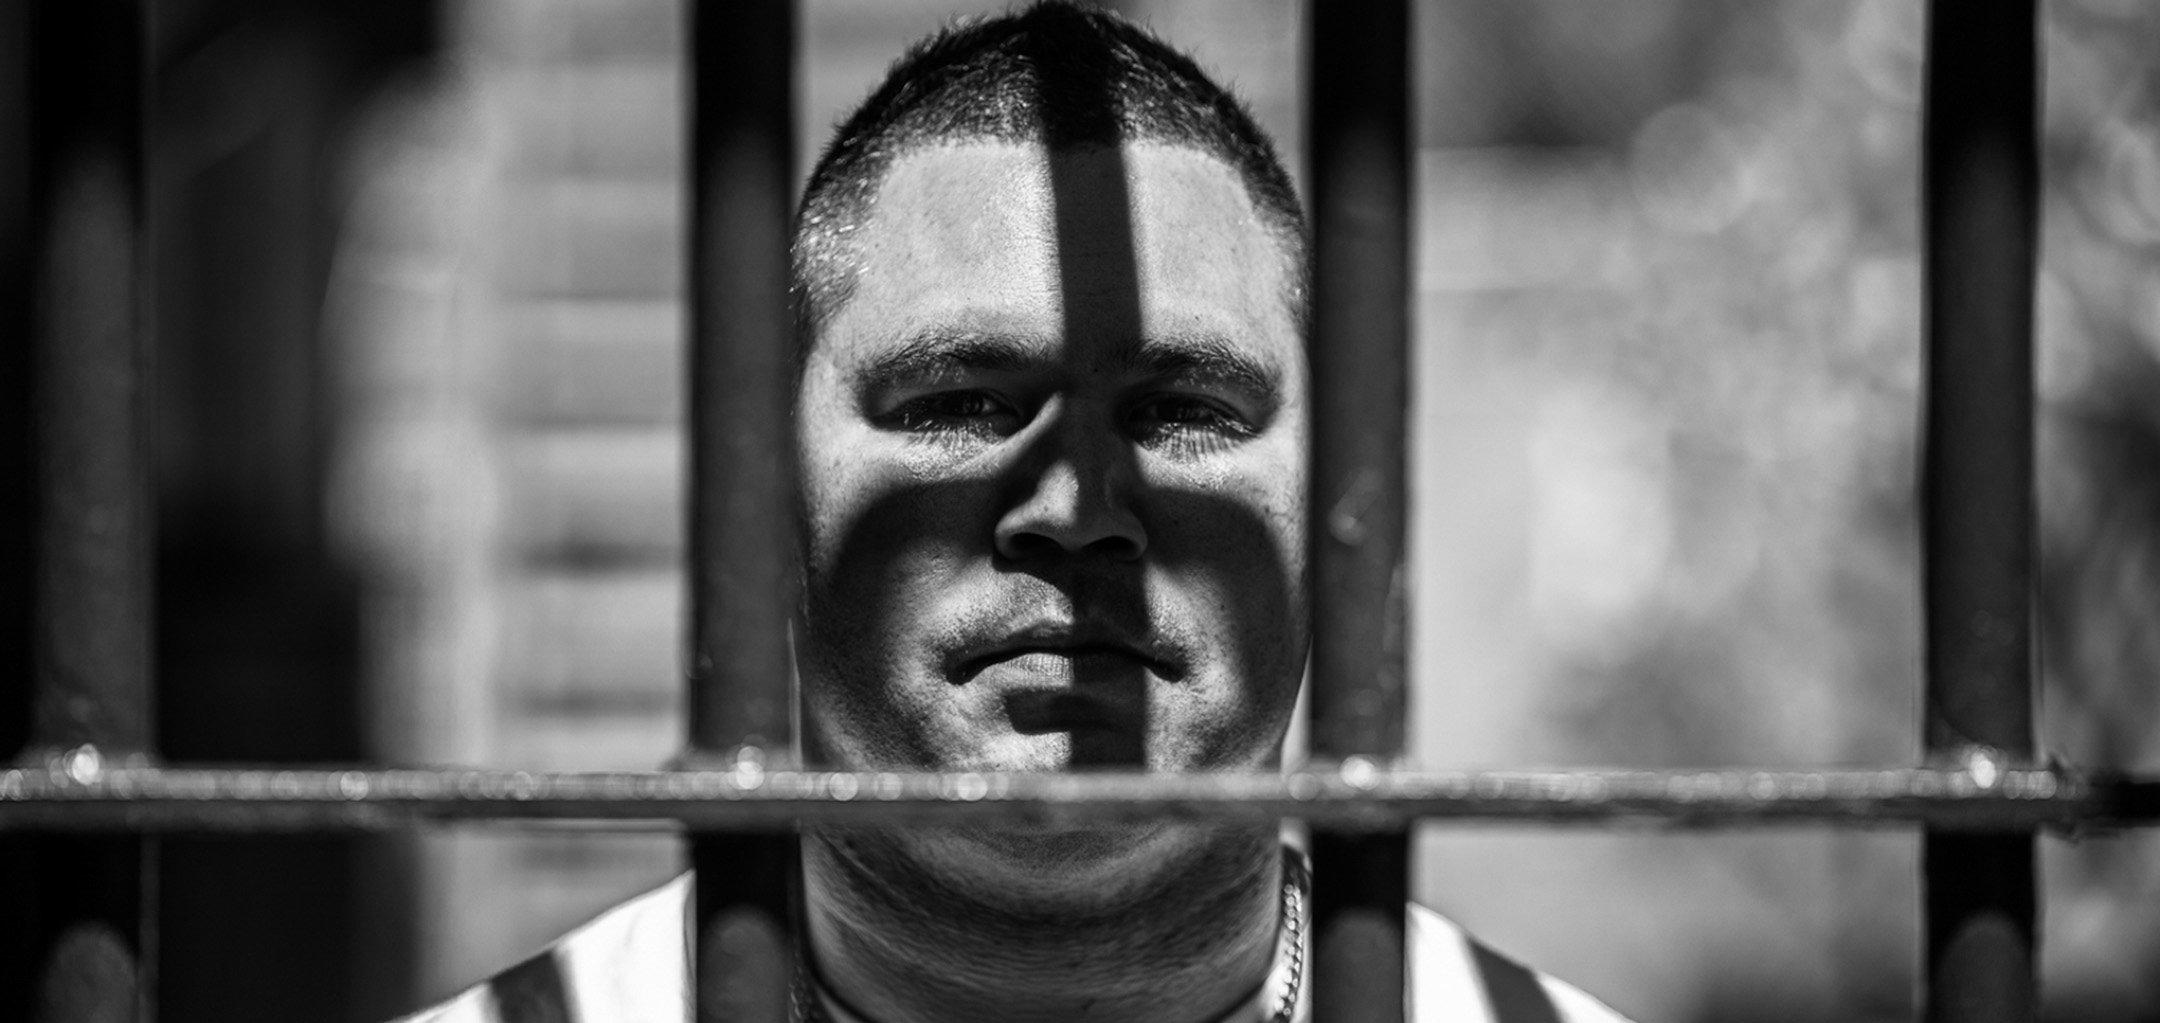 Keenan Mundine behind bars in a still from 'Incarceration Nation' (2021) (Courtesy incarcerationnation.com.au)